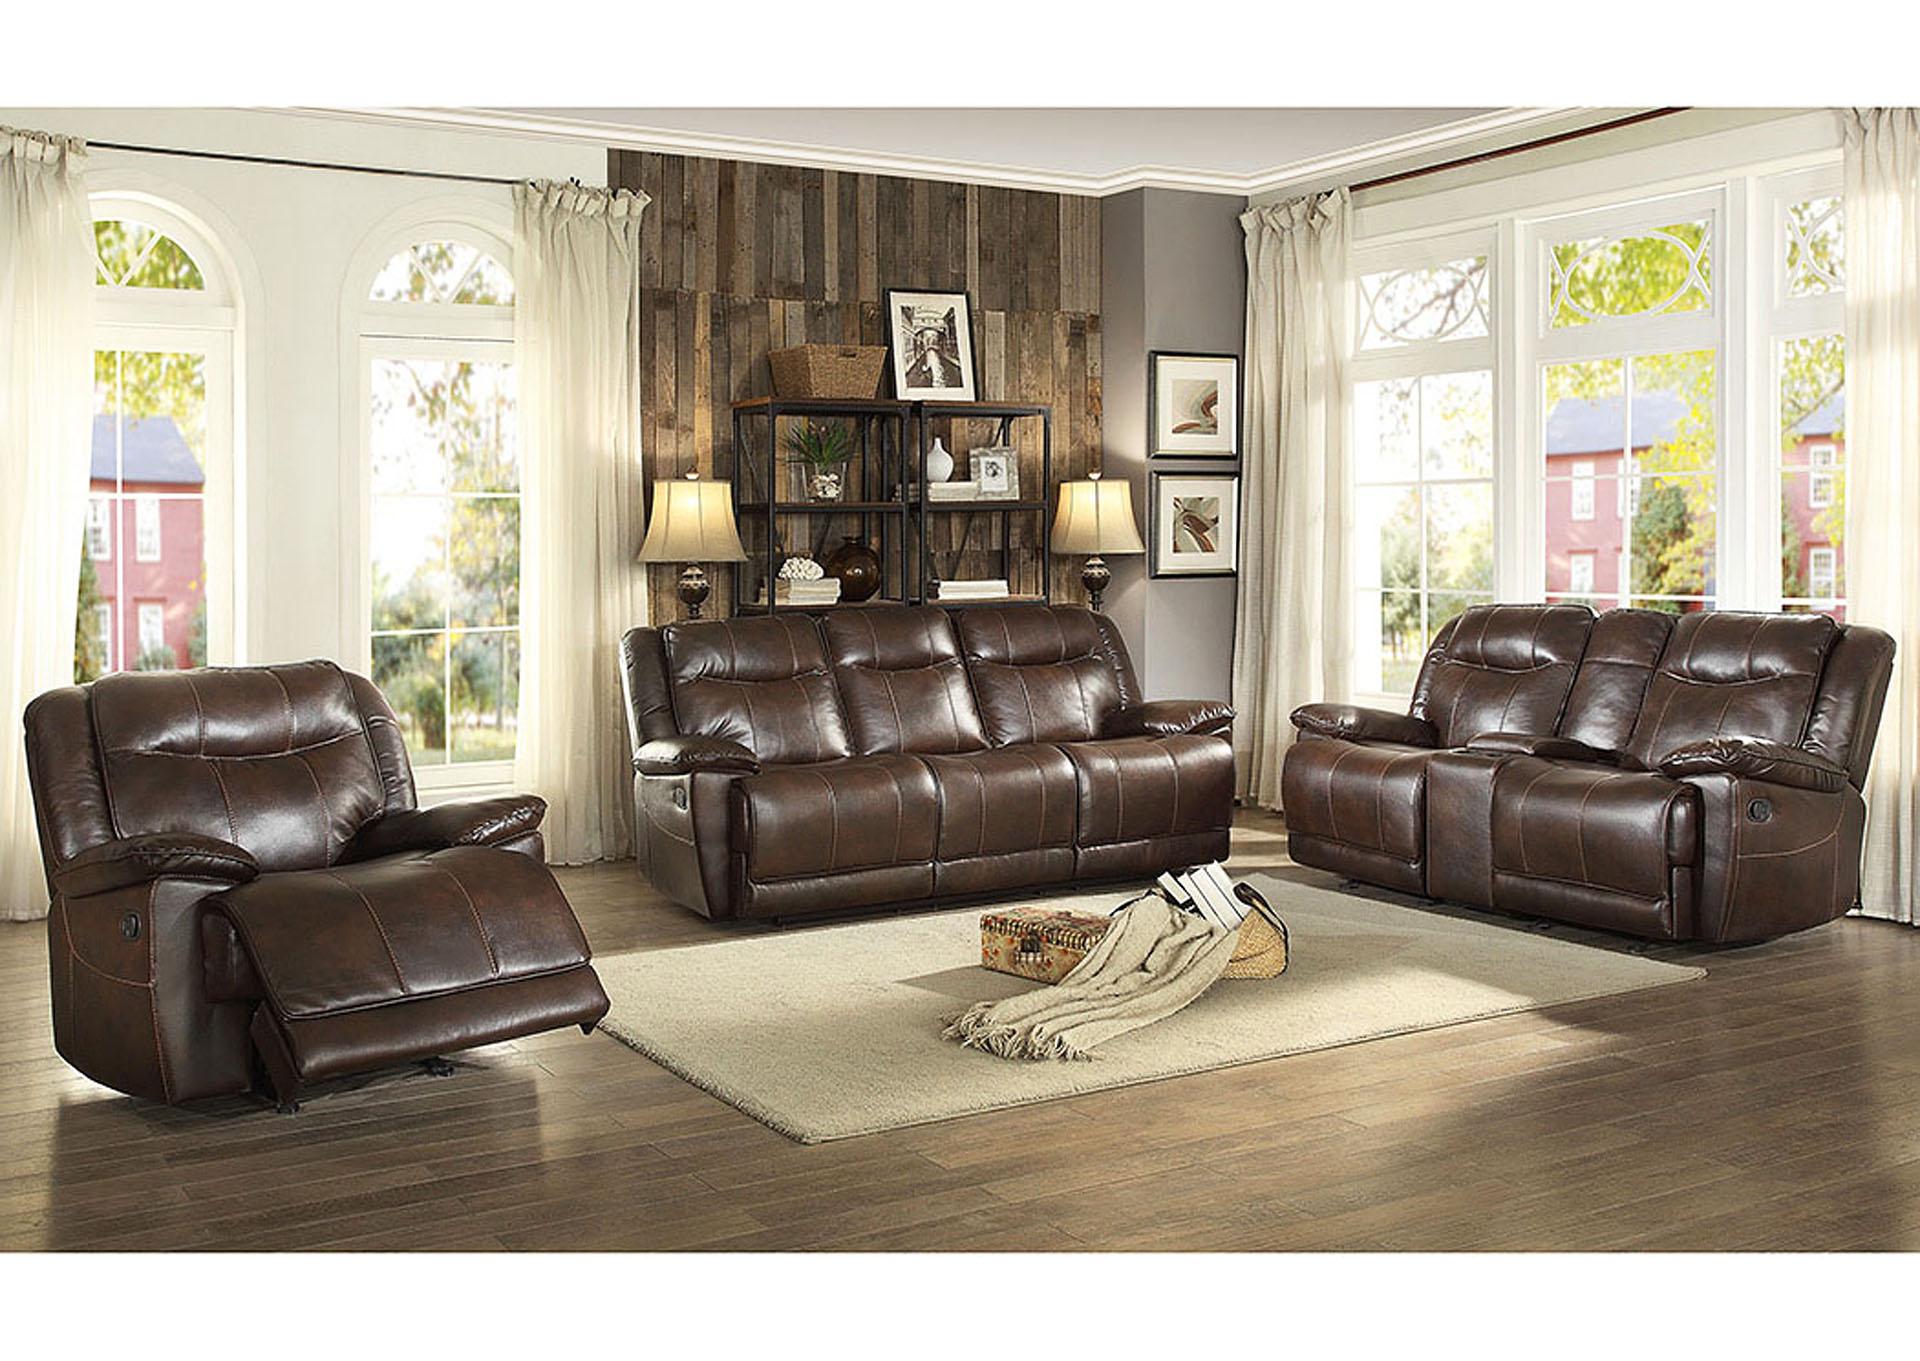 triple reclining sofa amazon sectionals bay shore furniture ny homelegance